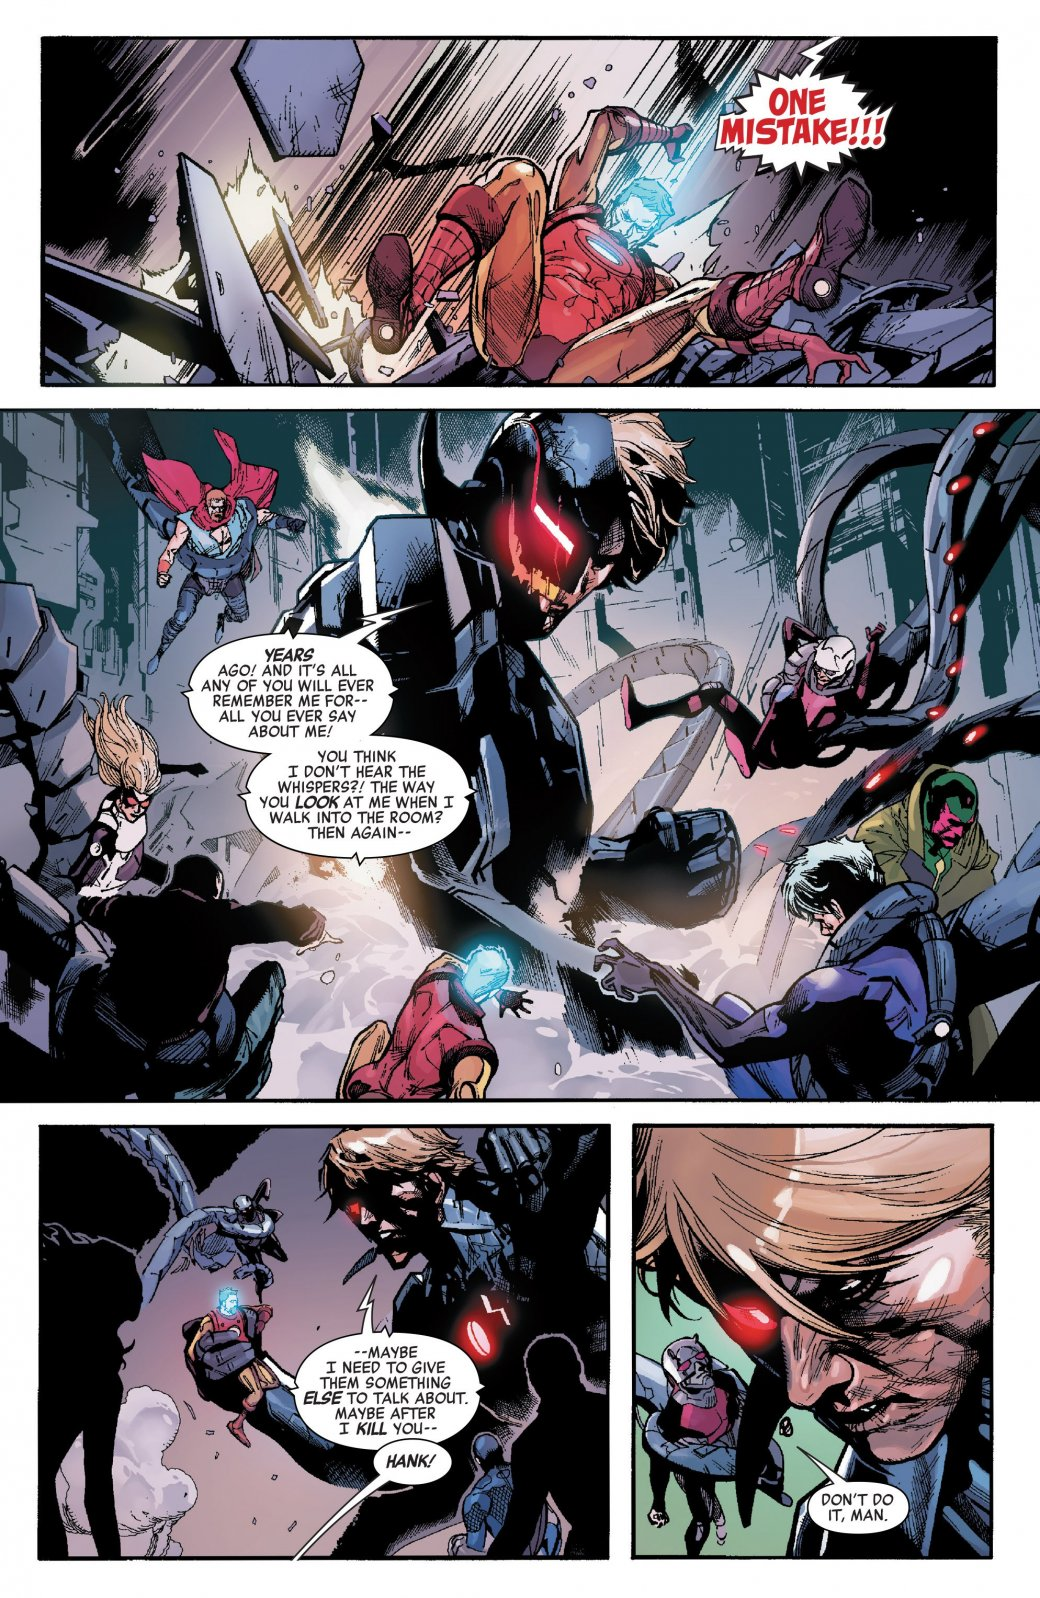 Secret Empire: противостоянию Стива Роджерса иТони Старка нет конца - Изображение 19